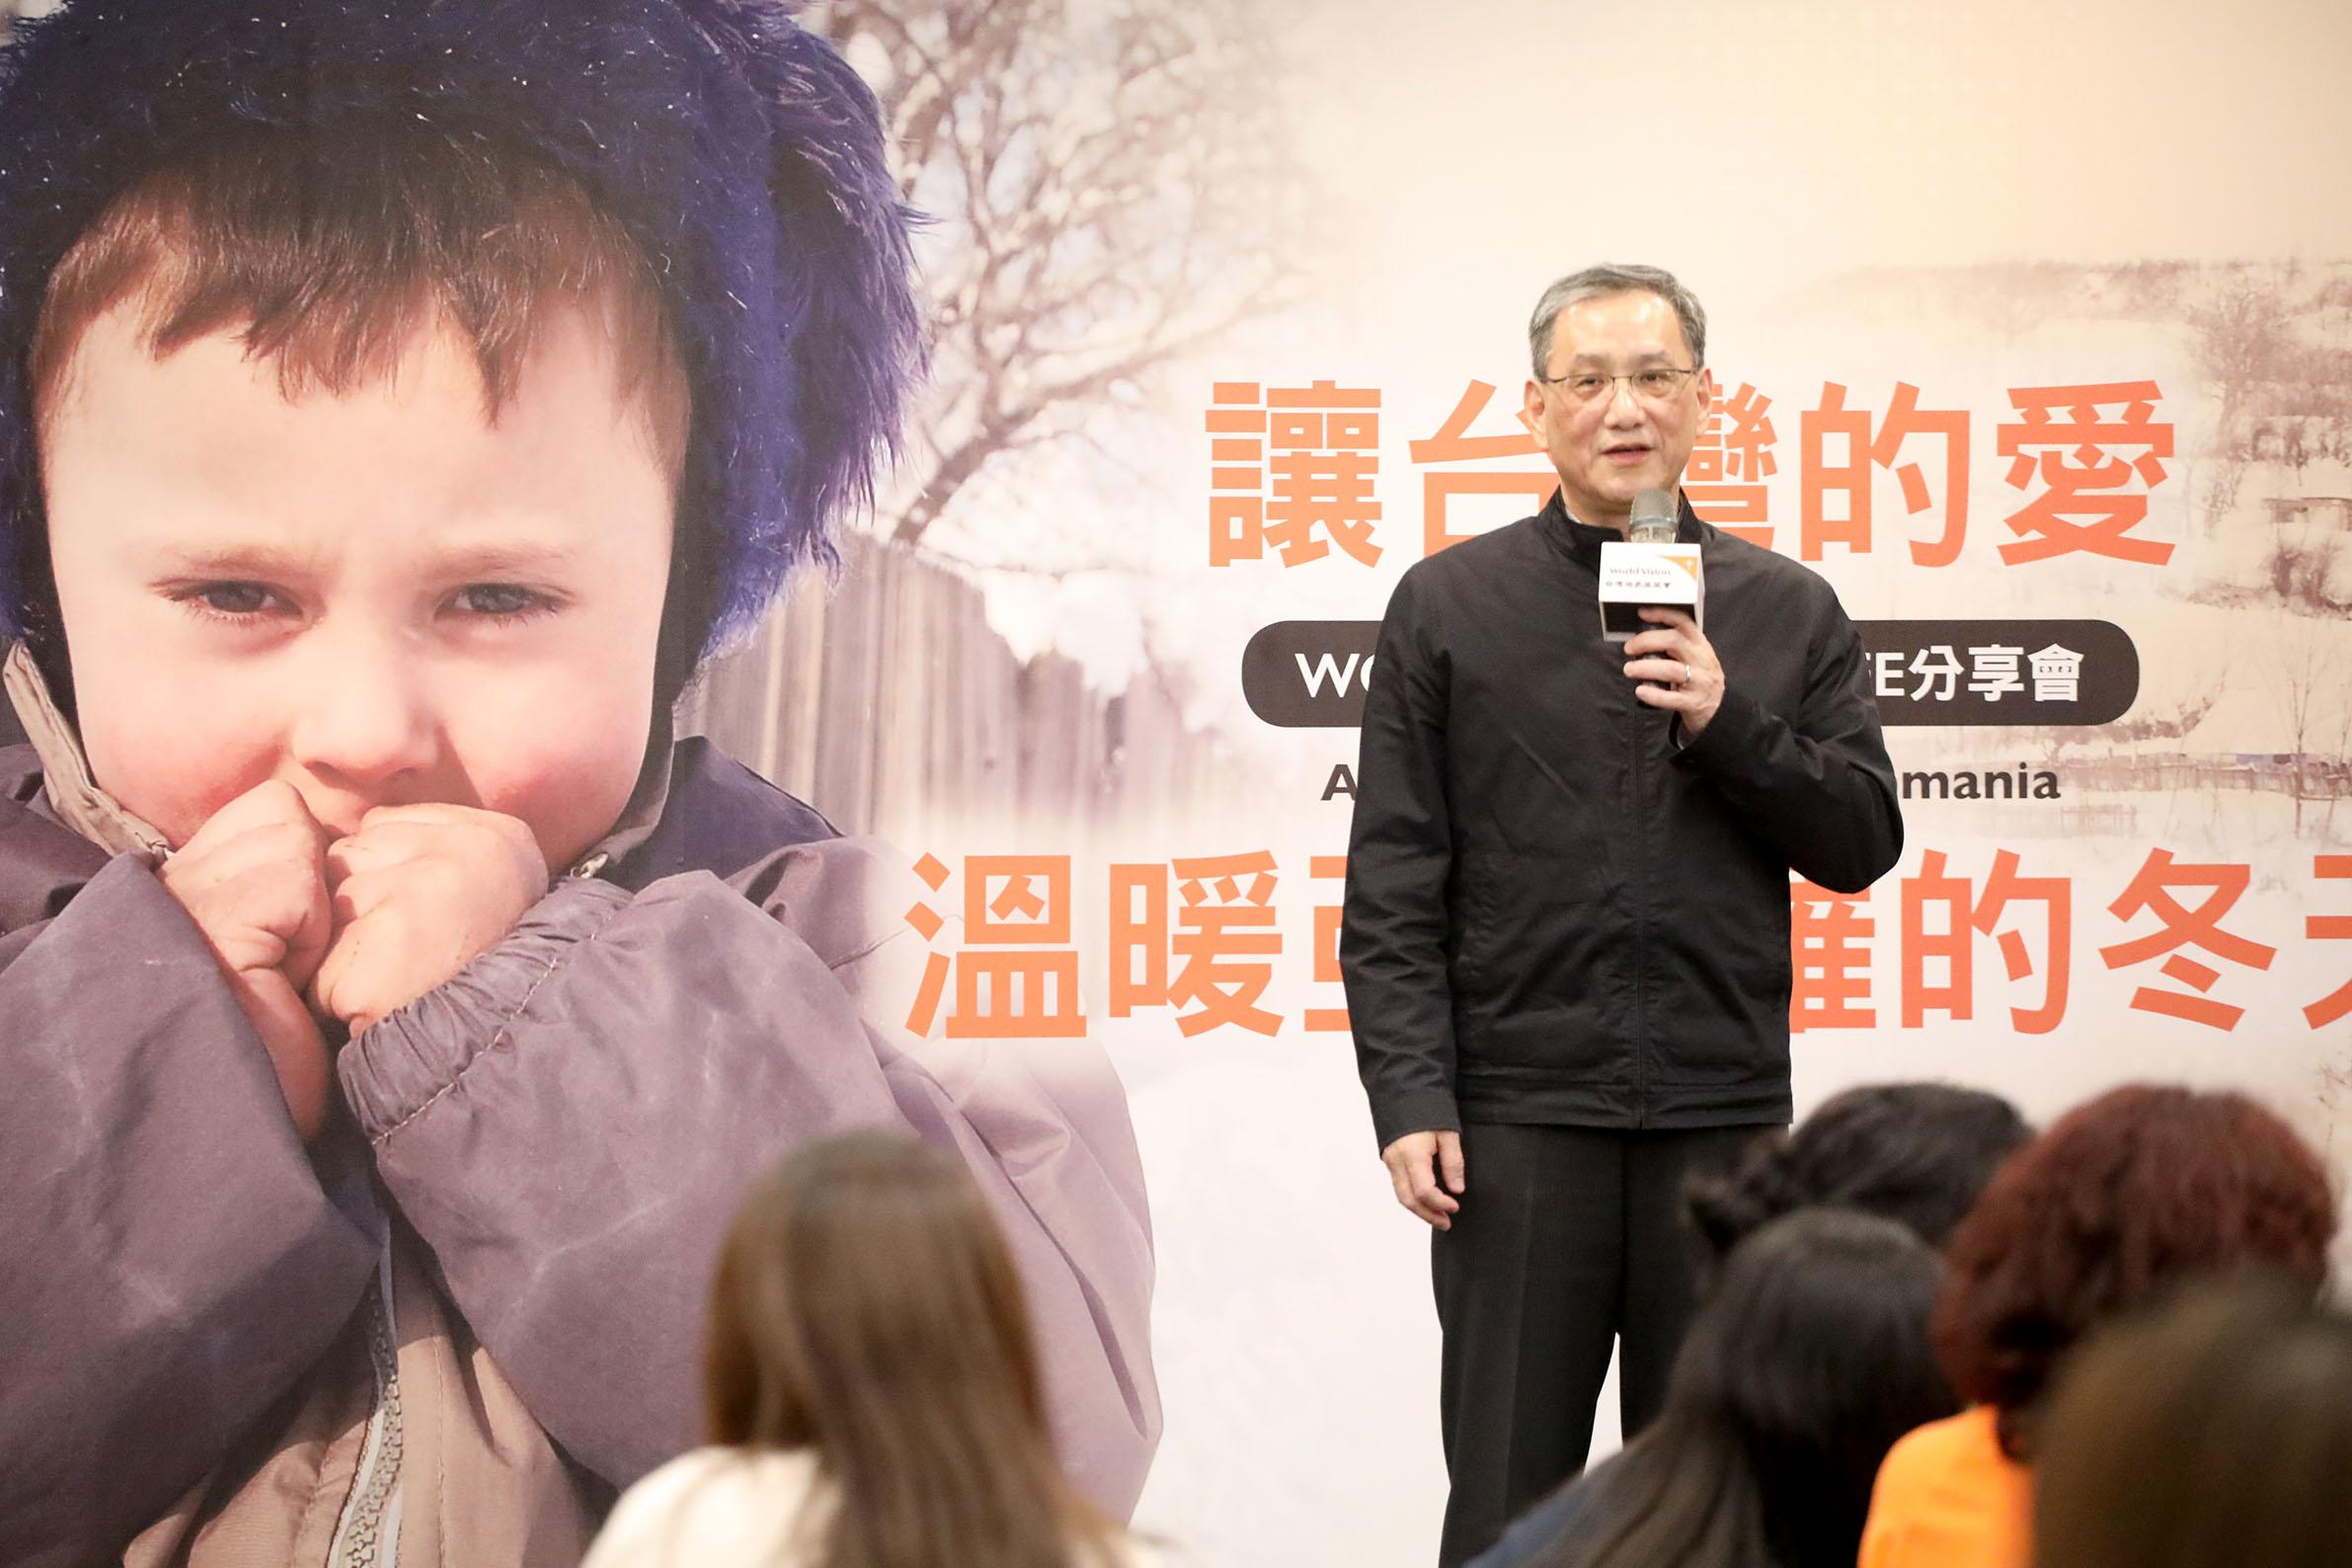 Speaker at the World Vision Taiwan forum on Romania, Bosnia-Herzegovina, and Armenia (Image courtesy of World Vision Taiwan)